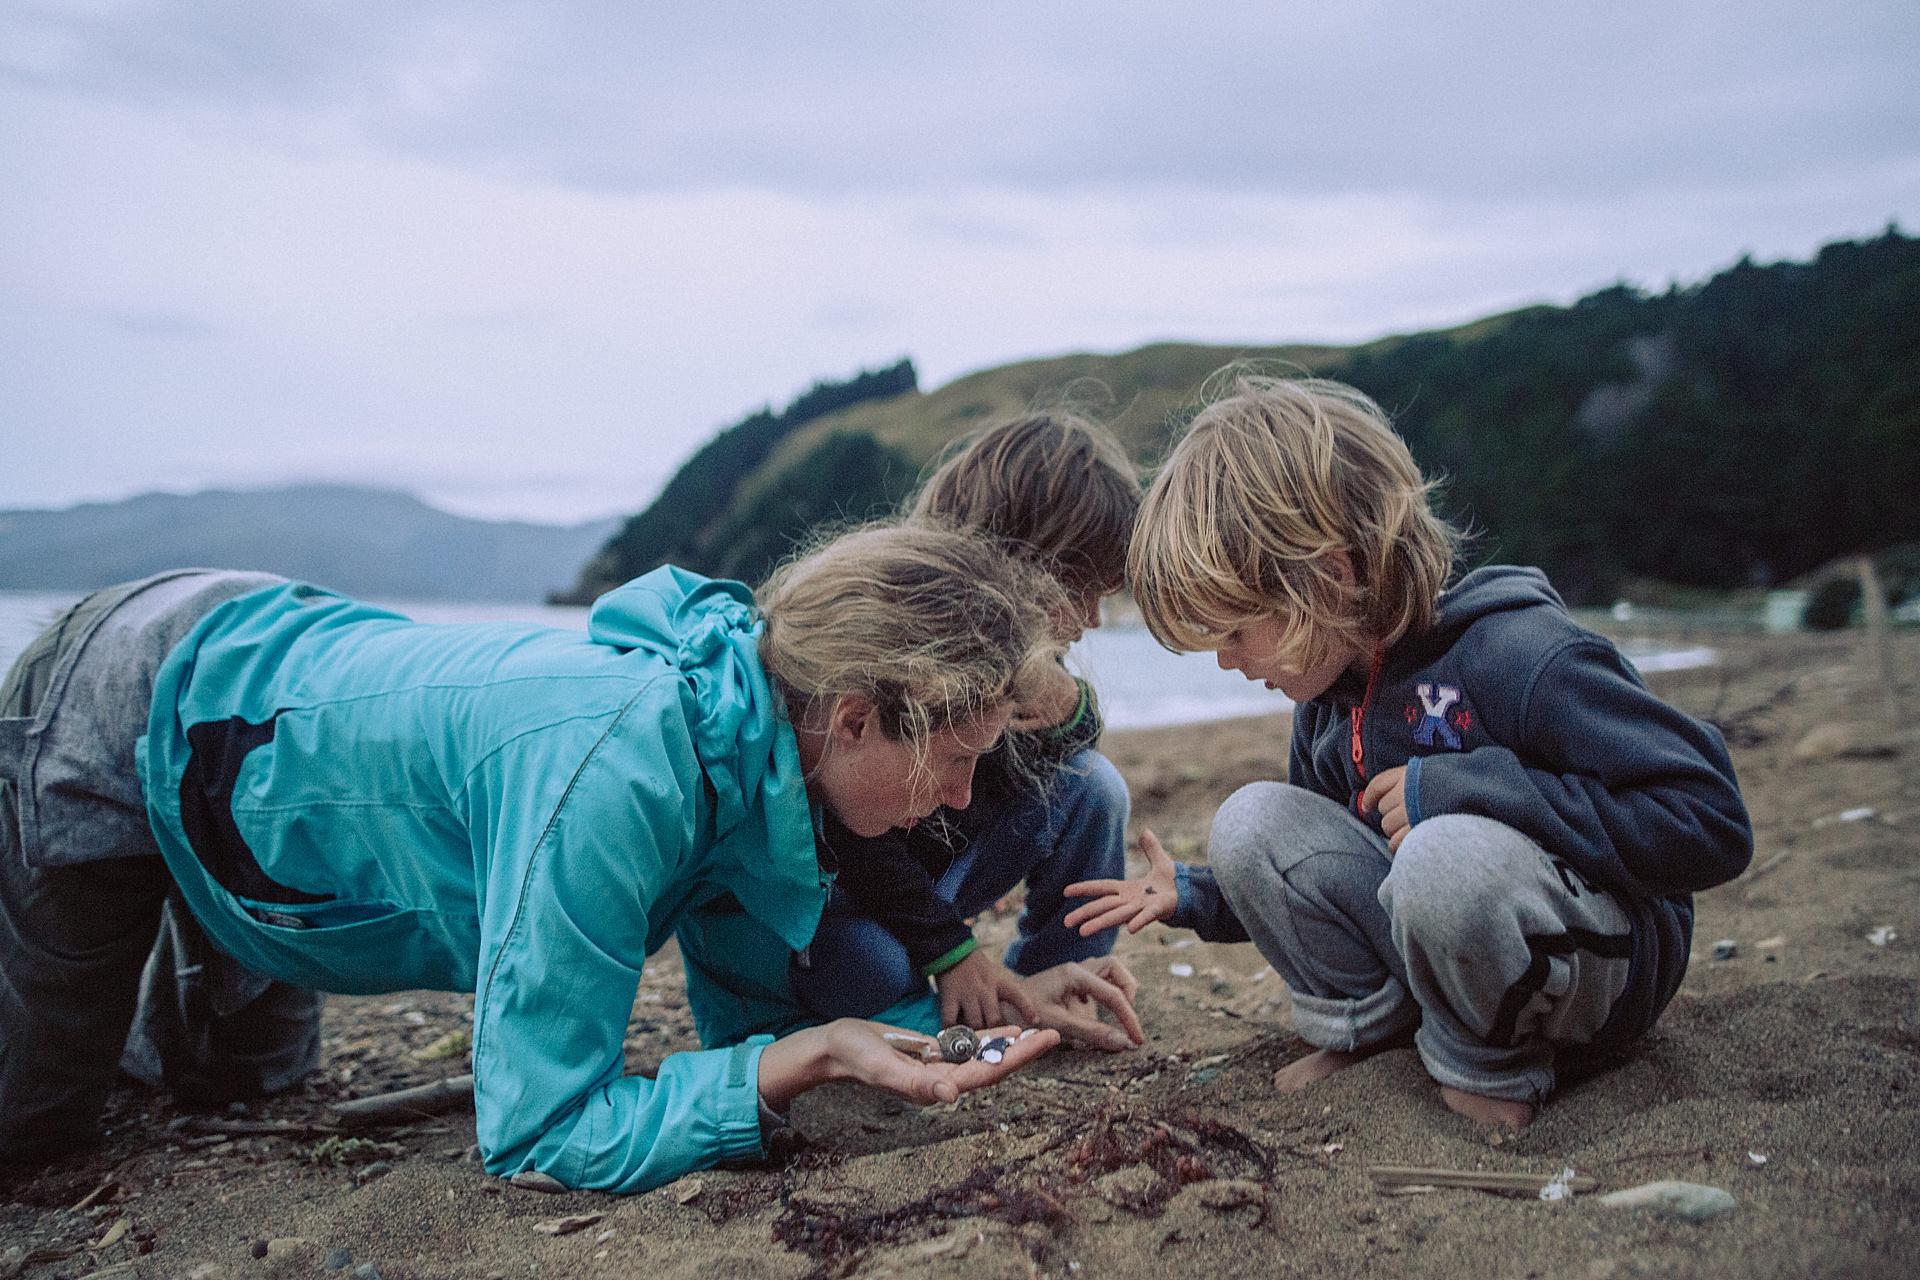 family-roadtrip-neuseeland-travelnewzealand-danielzube_0658.jpg